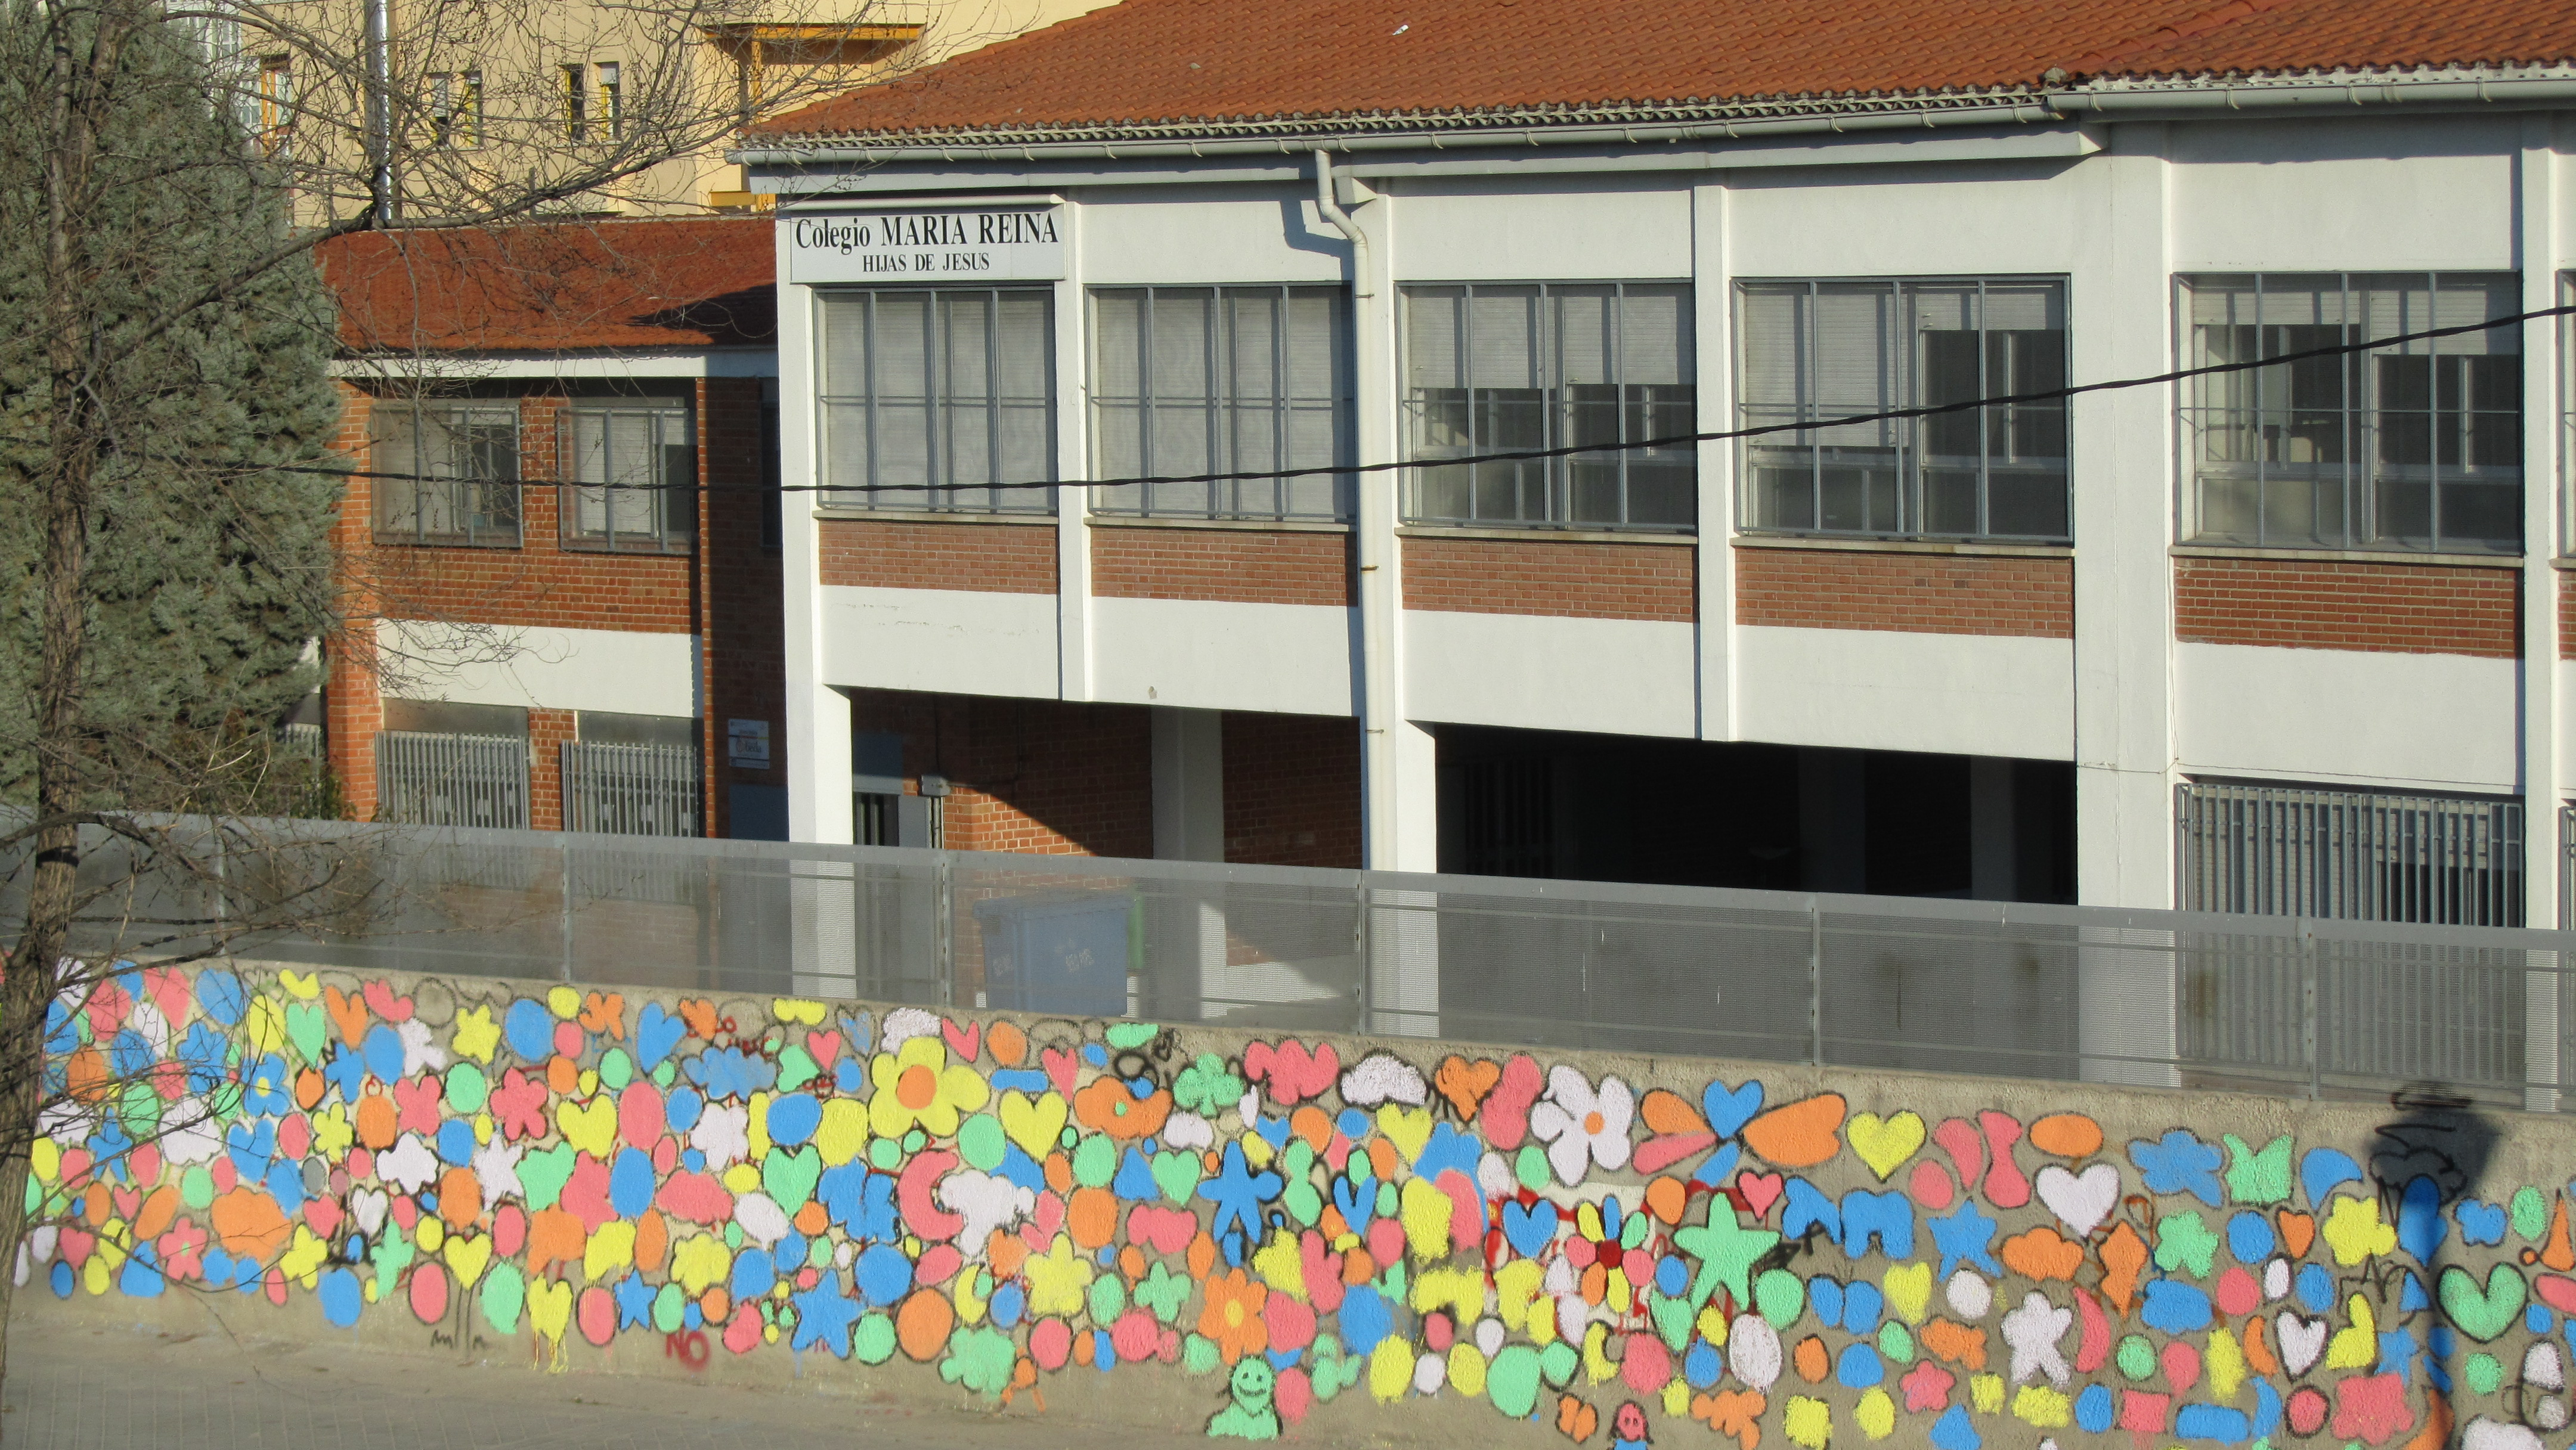 Colegios fi en madrid fasfi fundaci n ayuda solidaria - Colegio escolapias madrid ...